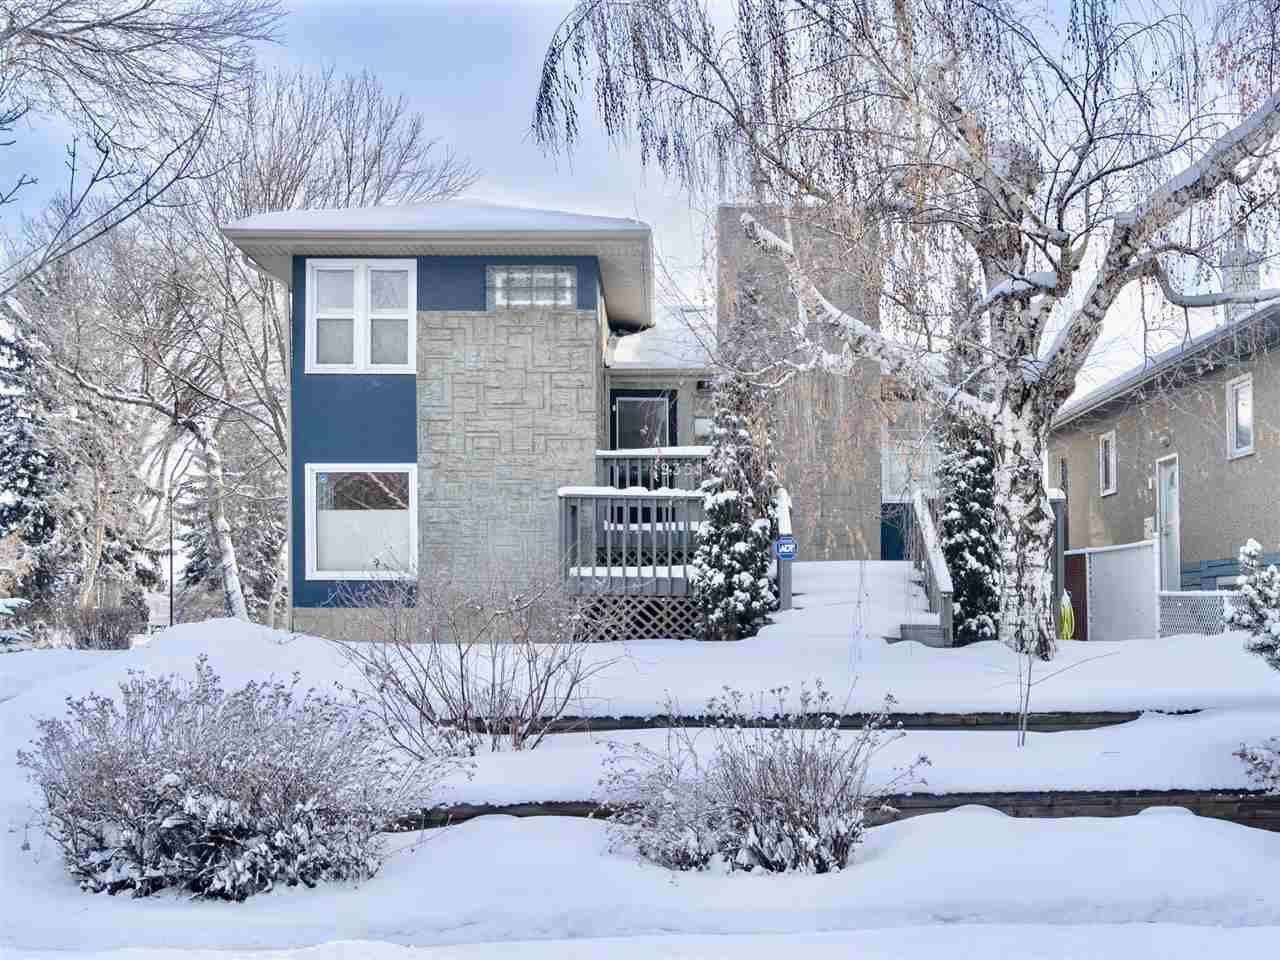 Main Photo: 9351 90 Street in Edmonton: Zone 18 House for sale : MLS®# E4143679